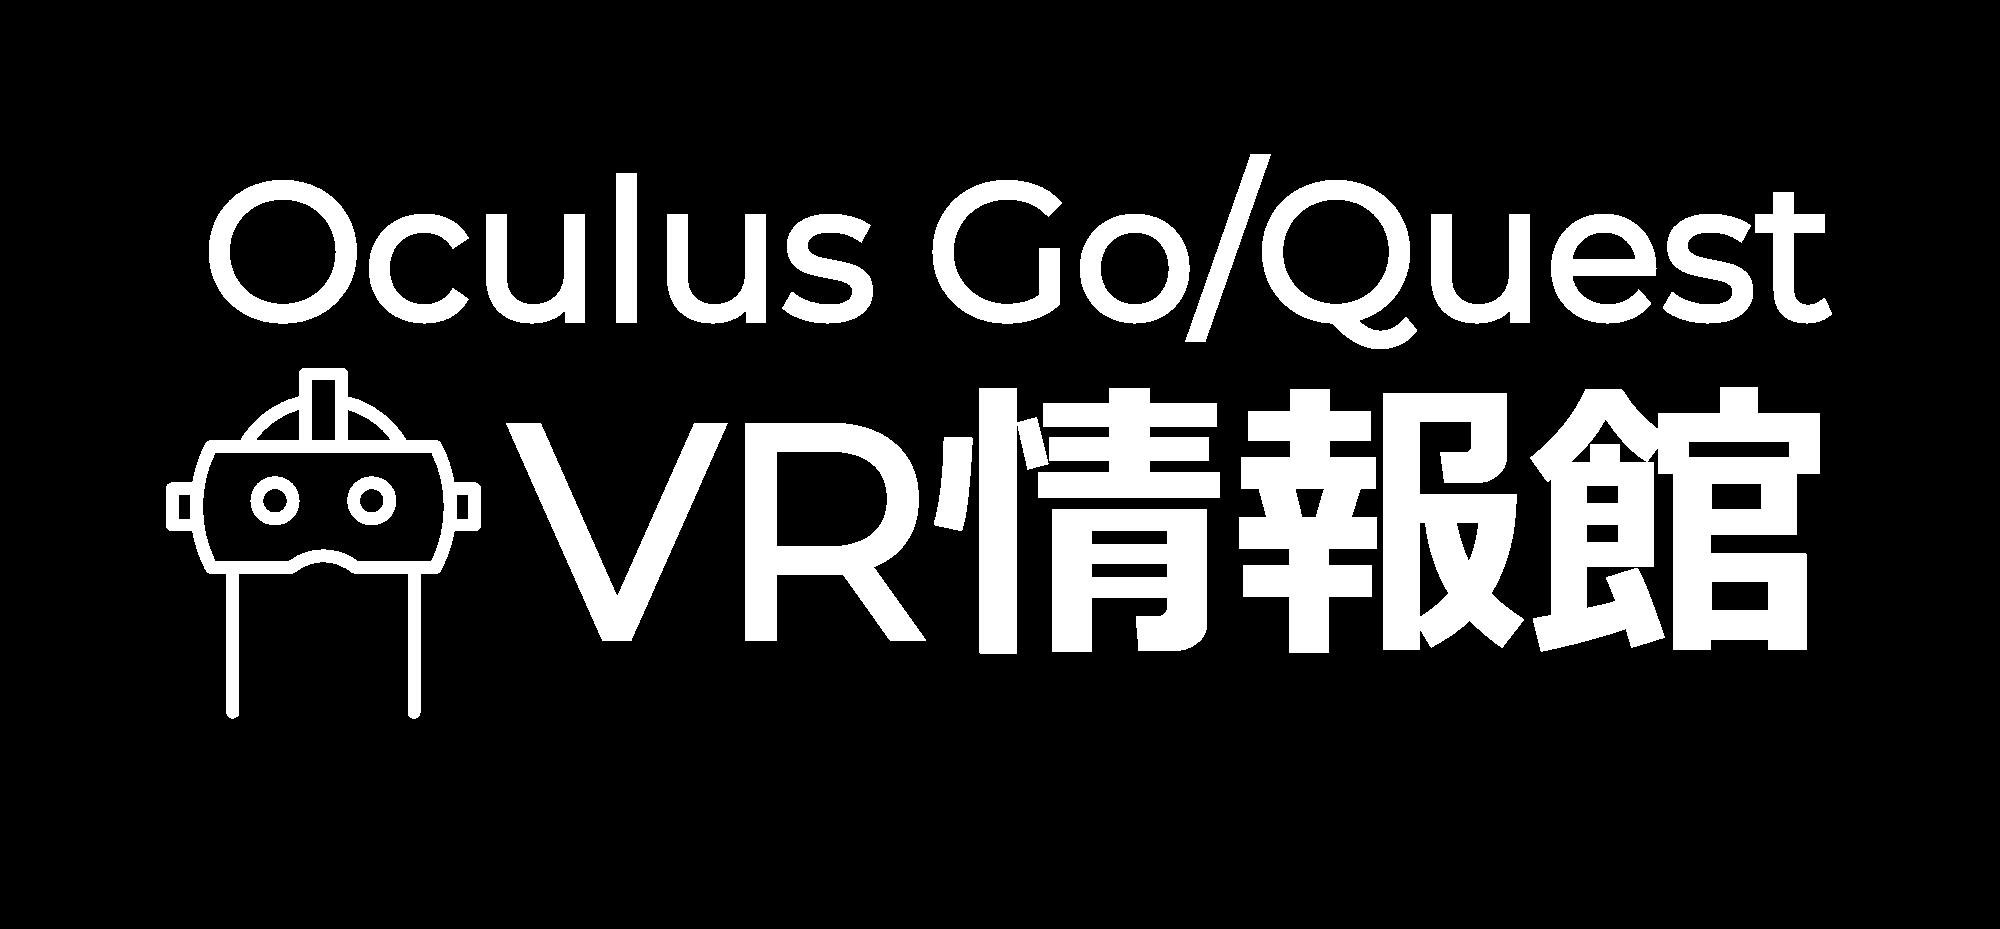 Oculus Go/Quest VR情報館